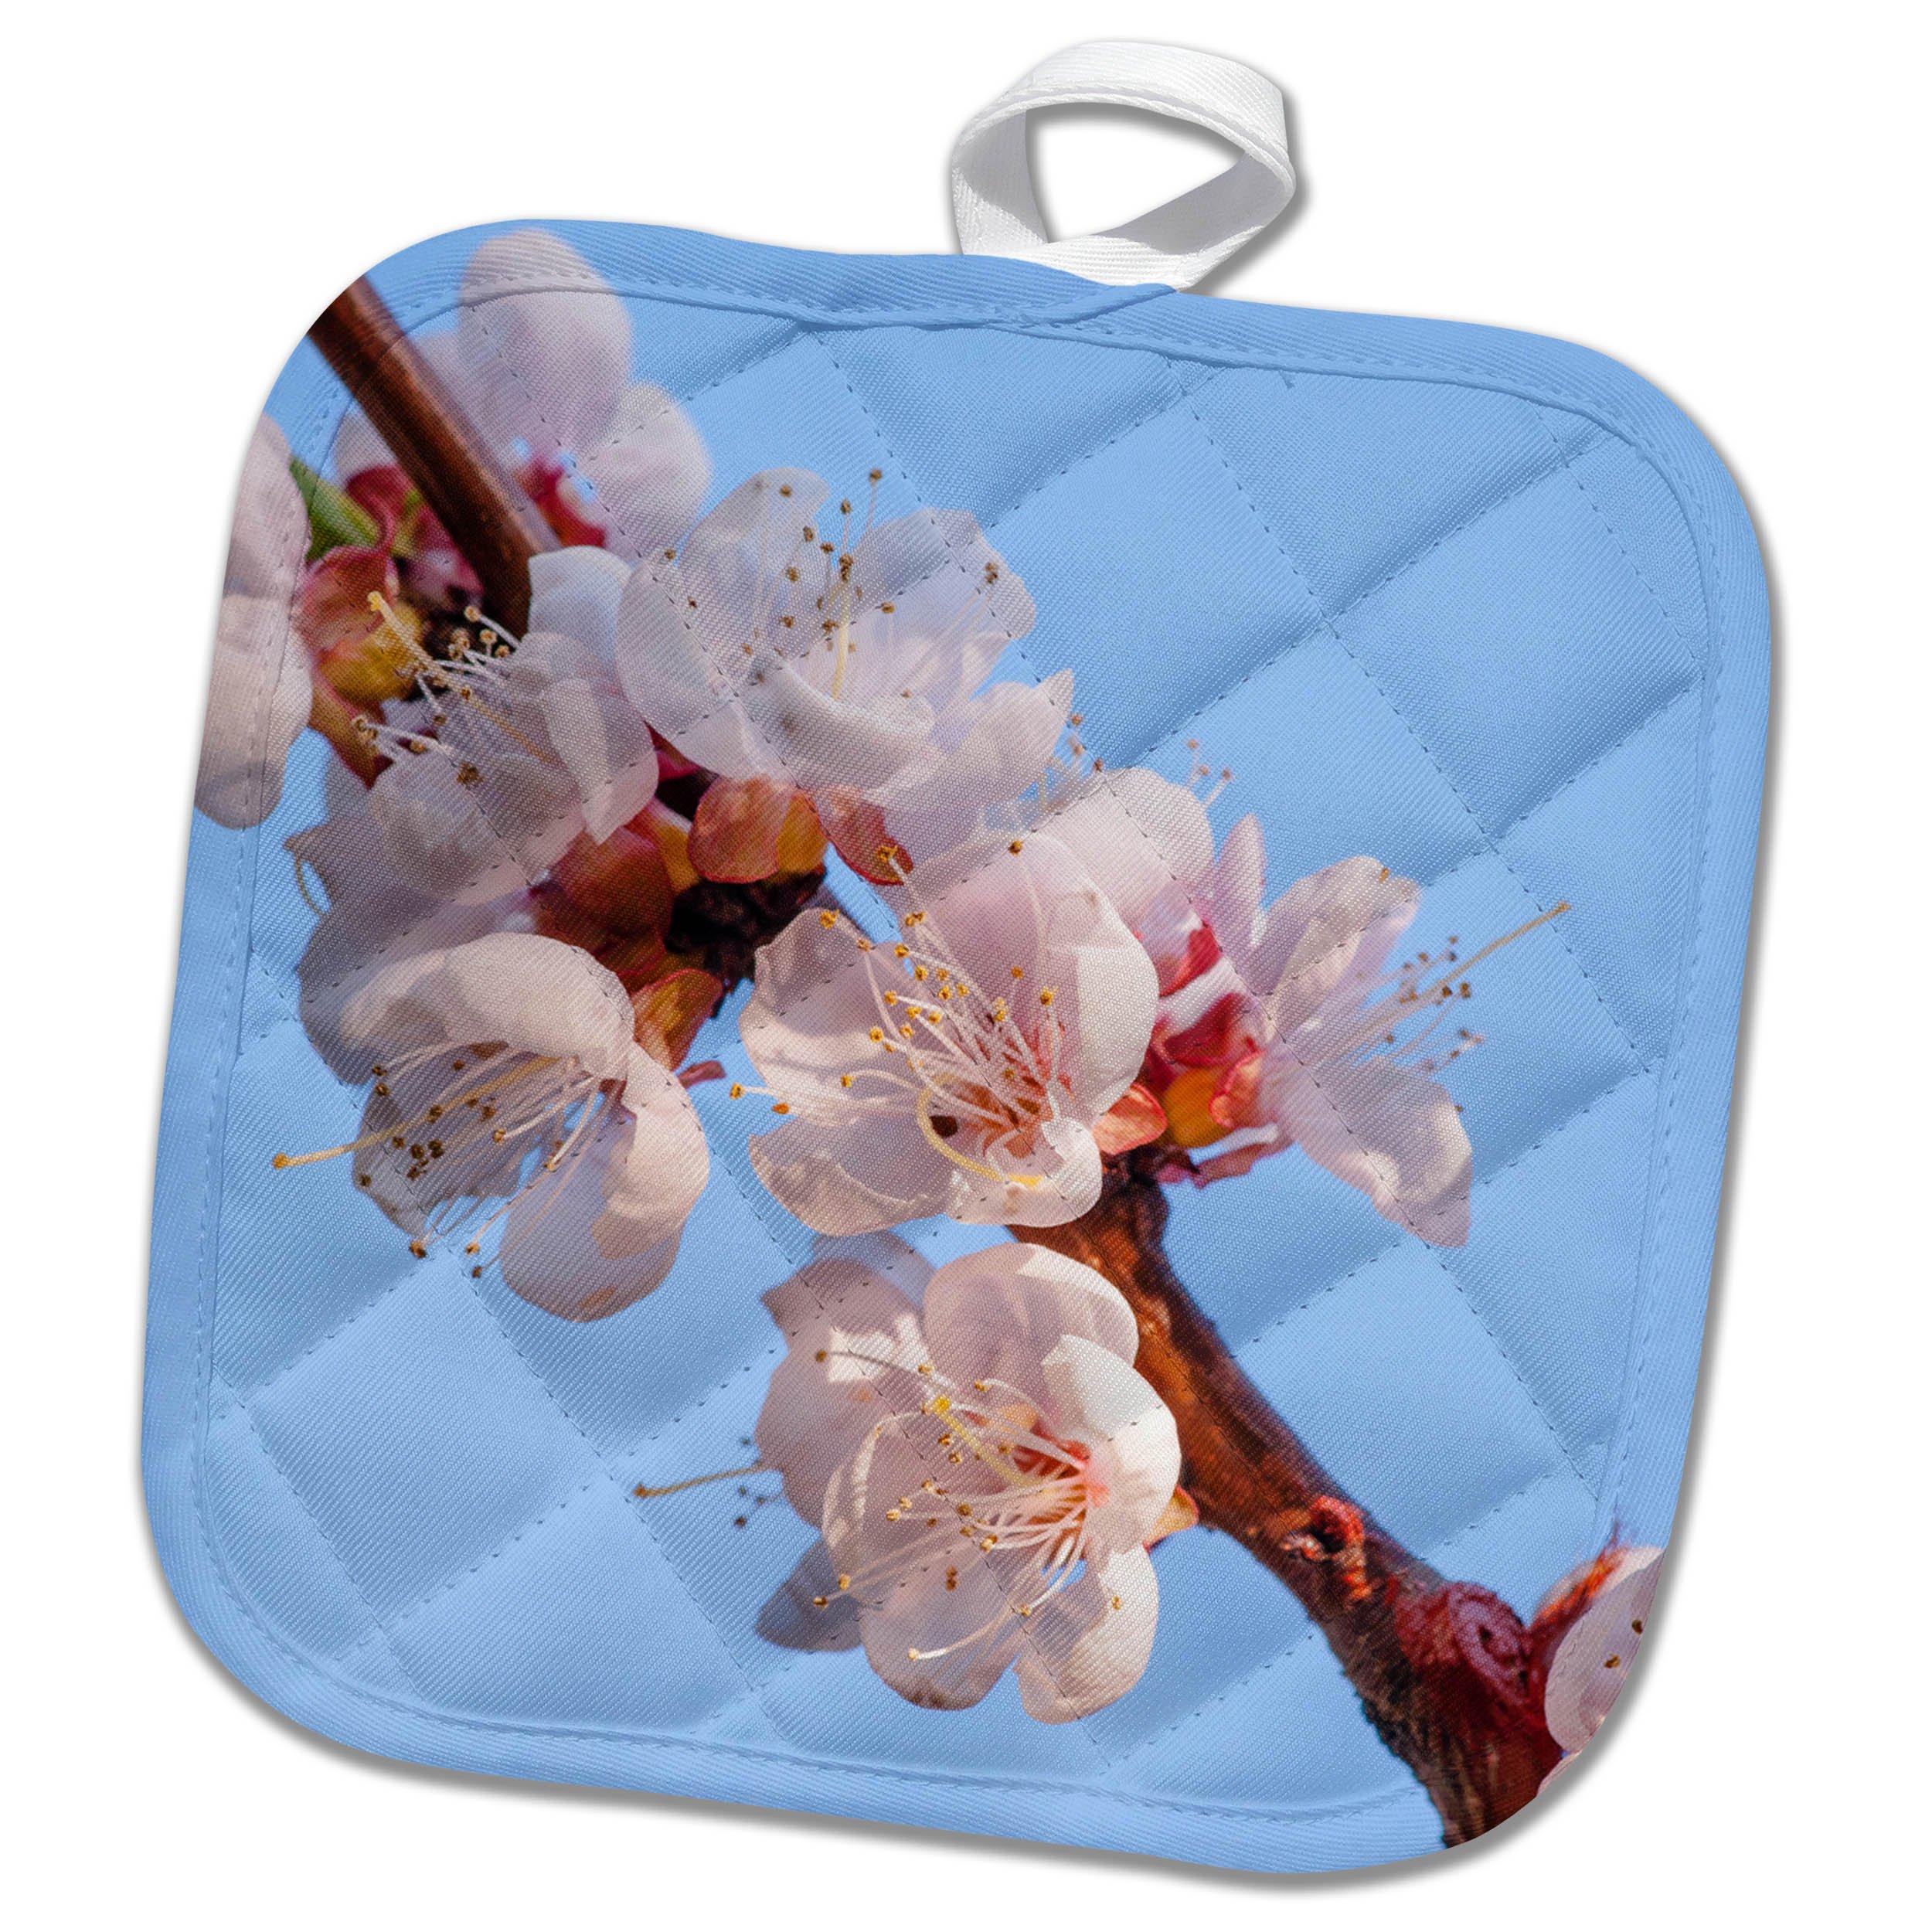 3dRose Alexis Photography - Flowers Sakura 2 - Diagonal of apricot flowers, pale blue sky - 8x8 Potholder (phl_272476_1)